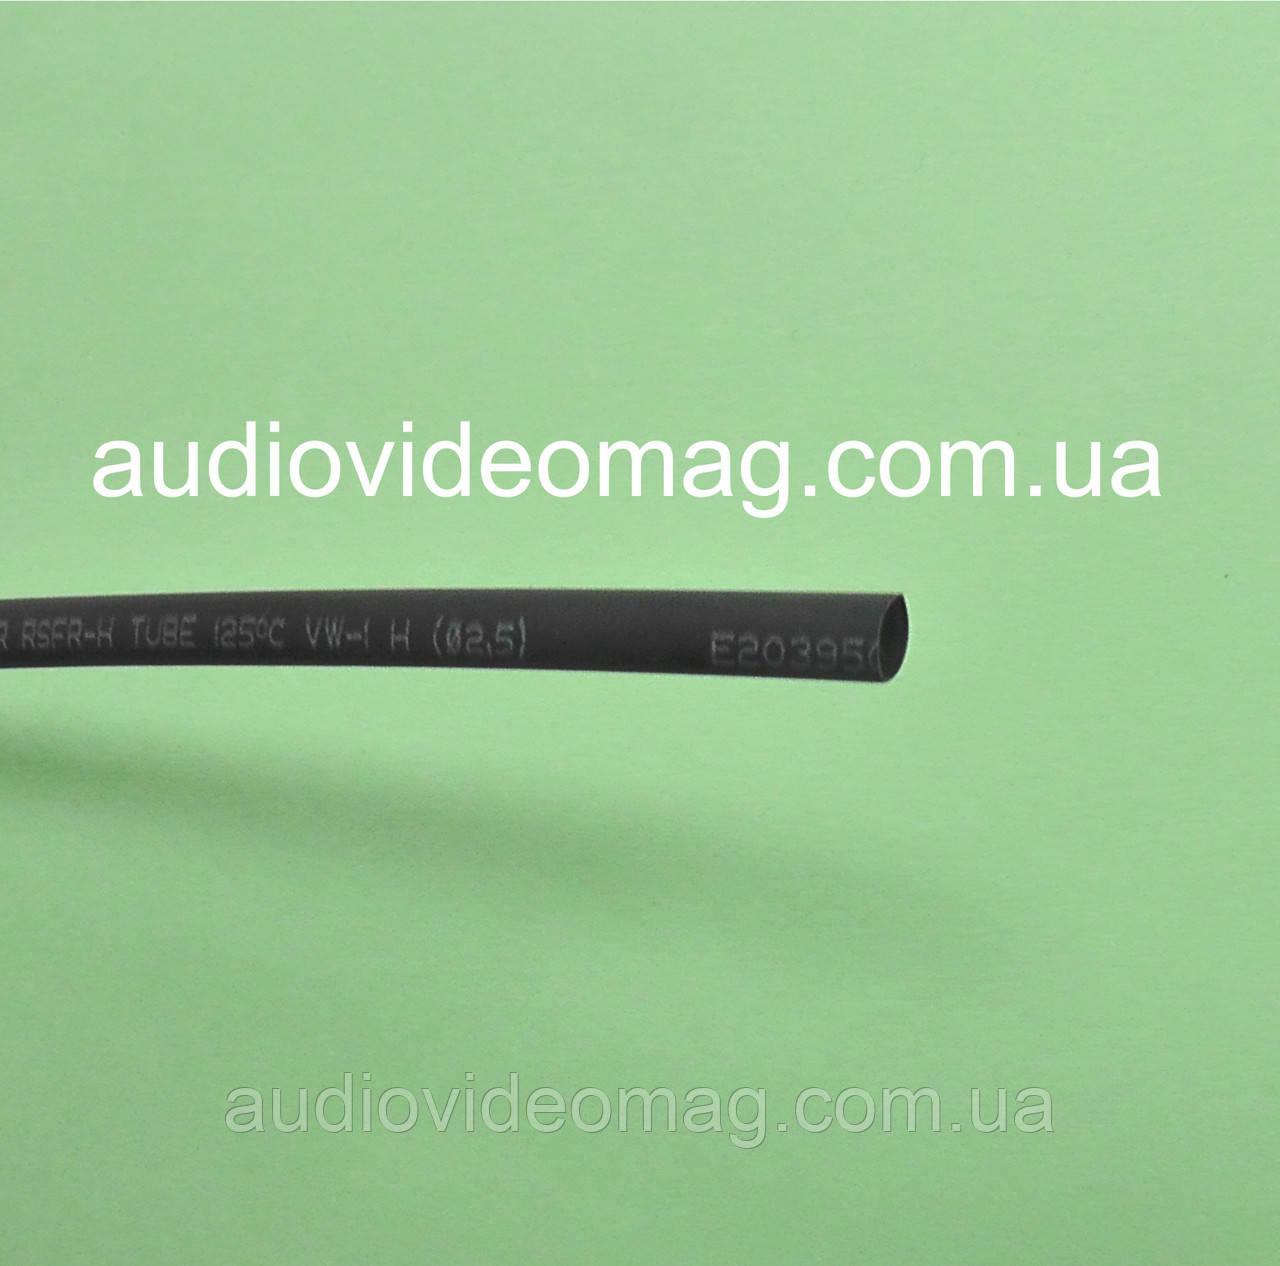 Термоусадочная трубка (2:1) - 2.5/1.25 мм, 1 метр, черная